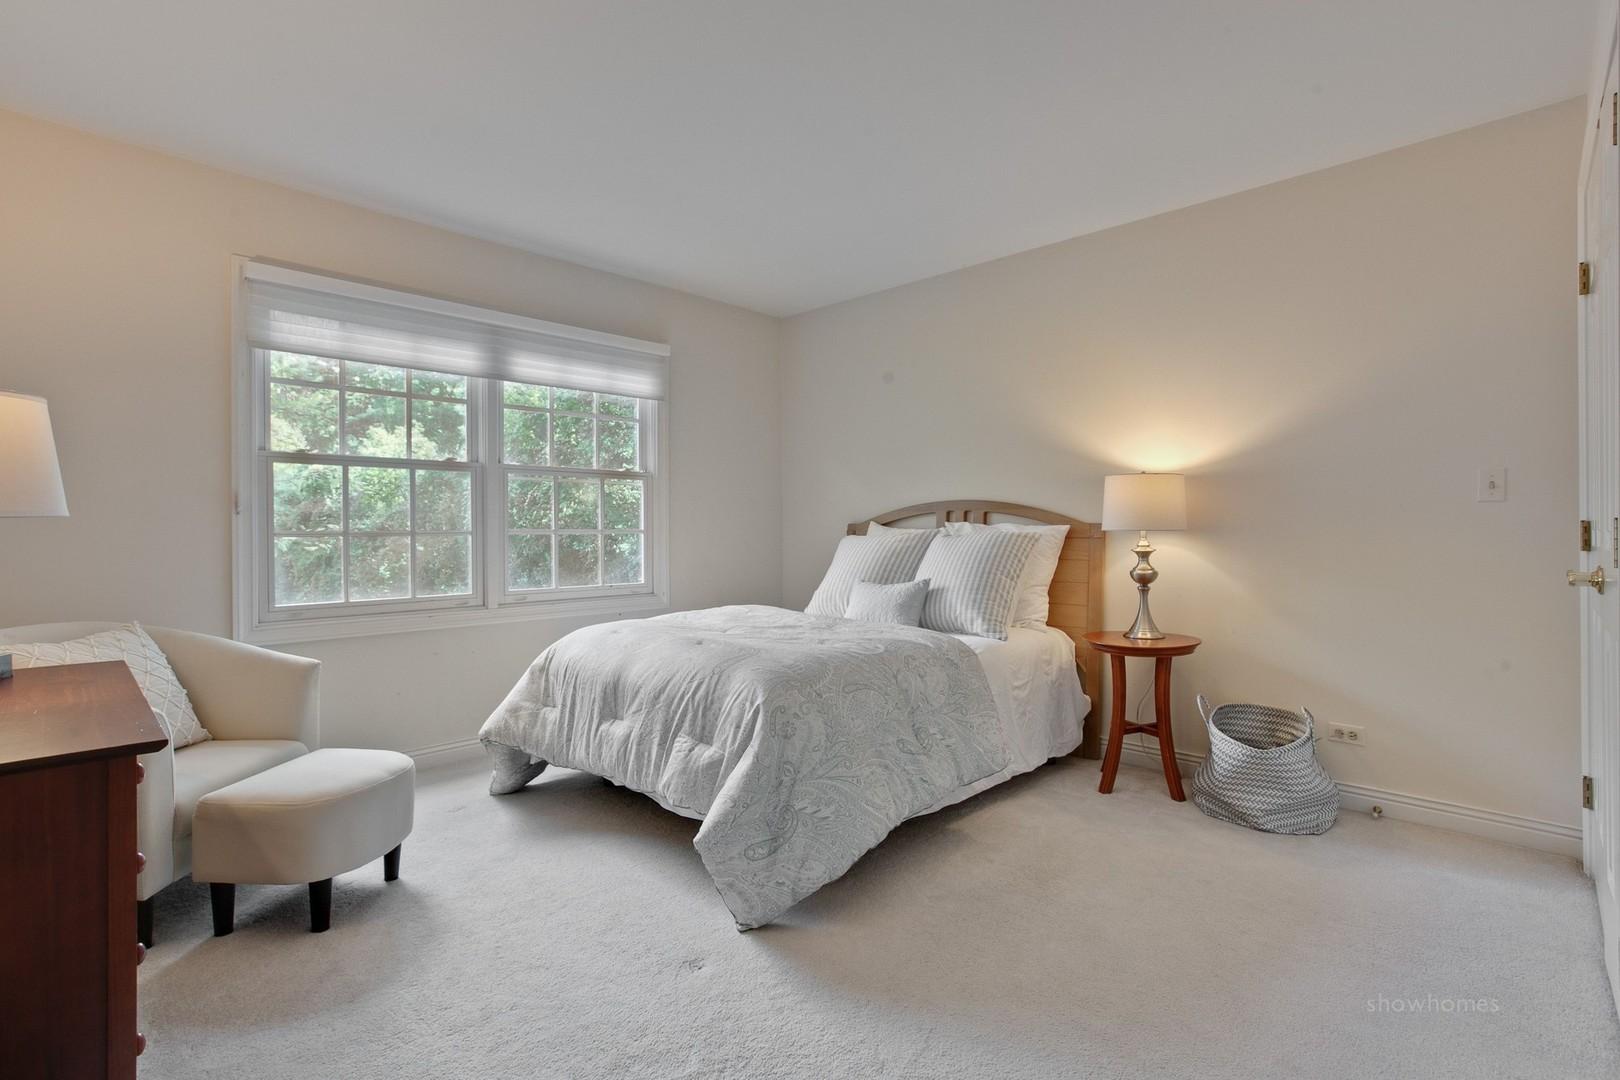 1701 Harvard, Lake Forest, Illinois, 60045